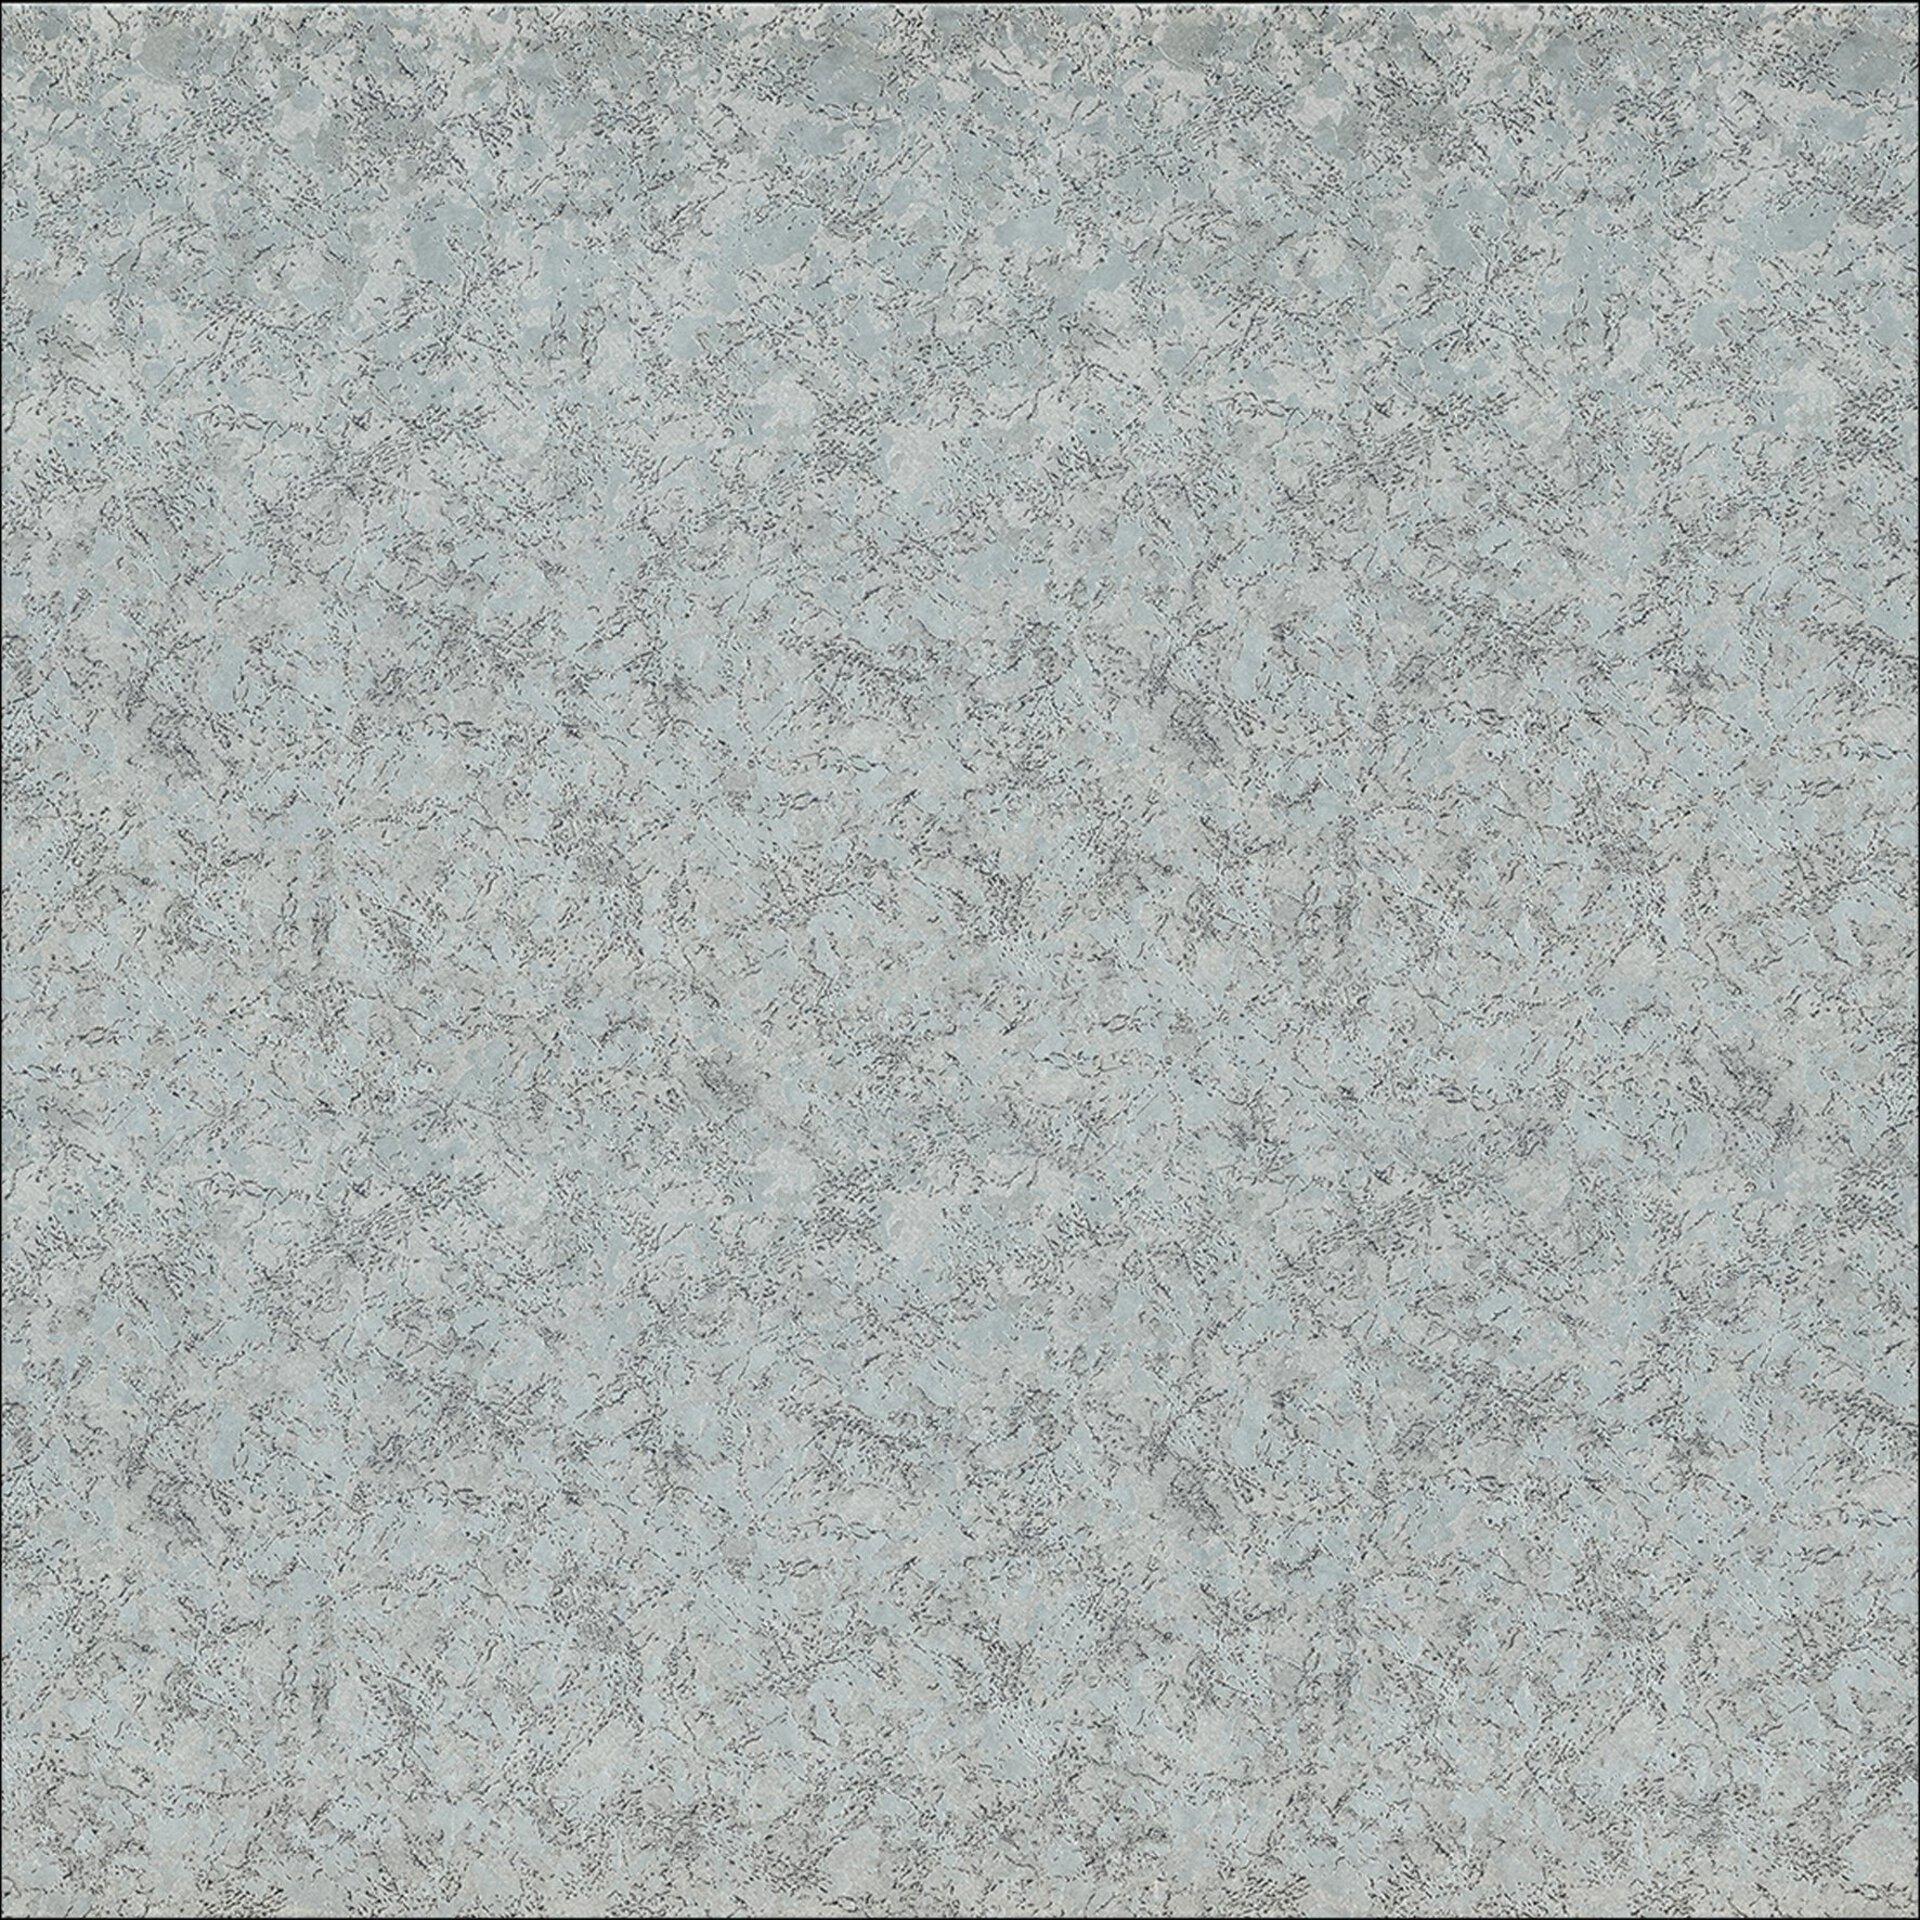 Bild Silber Pro-Art Glas 50 x 50 x 1 cm